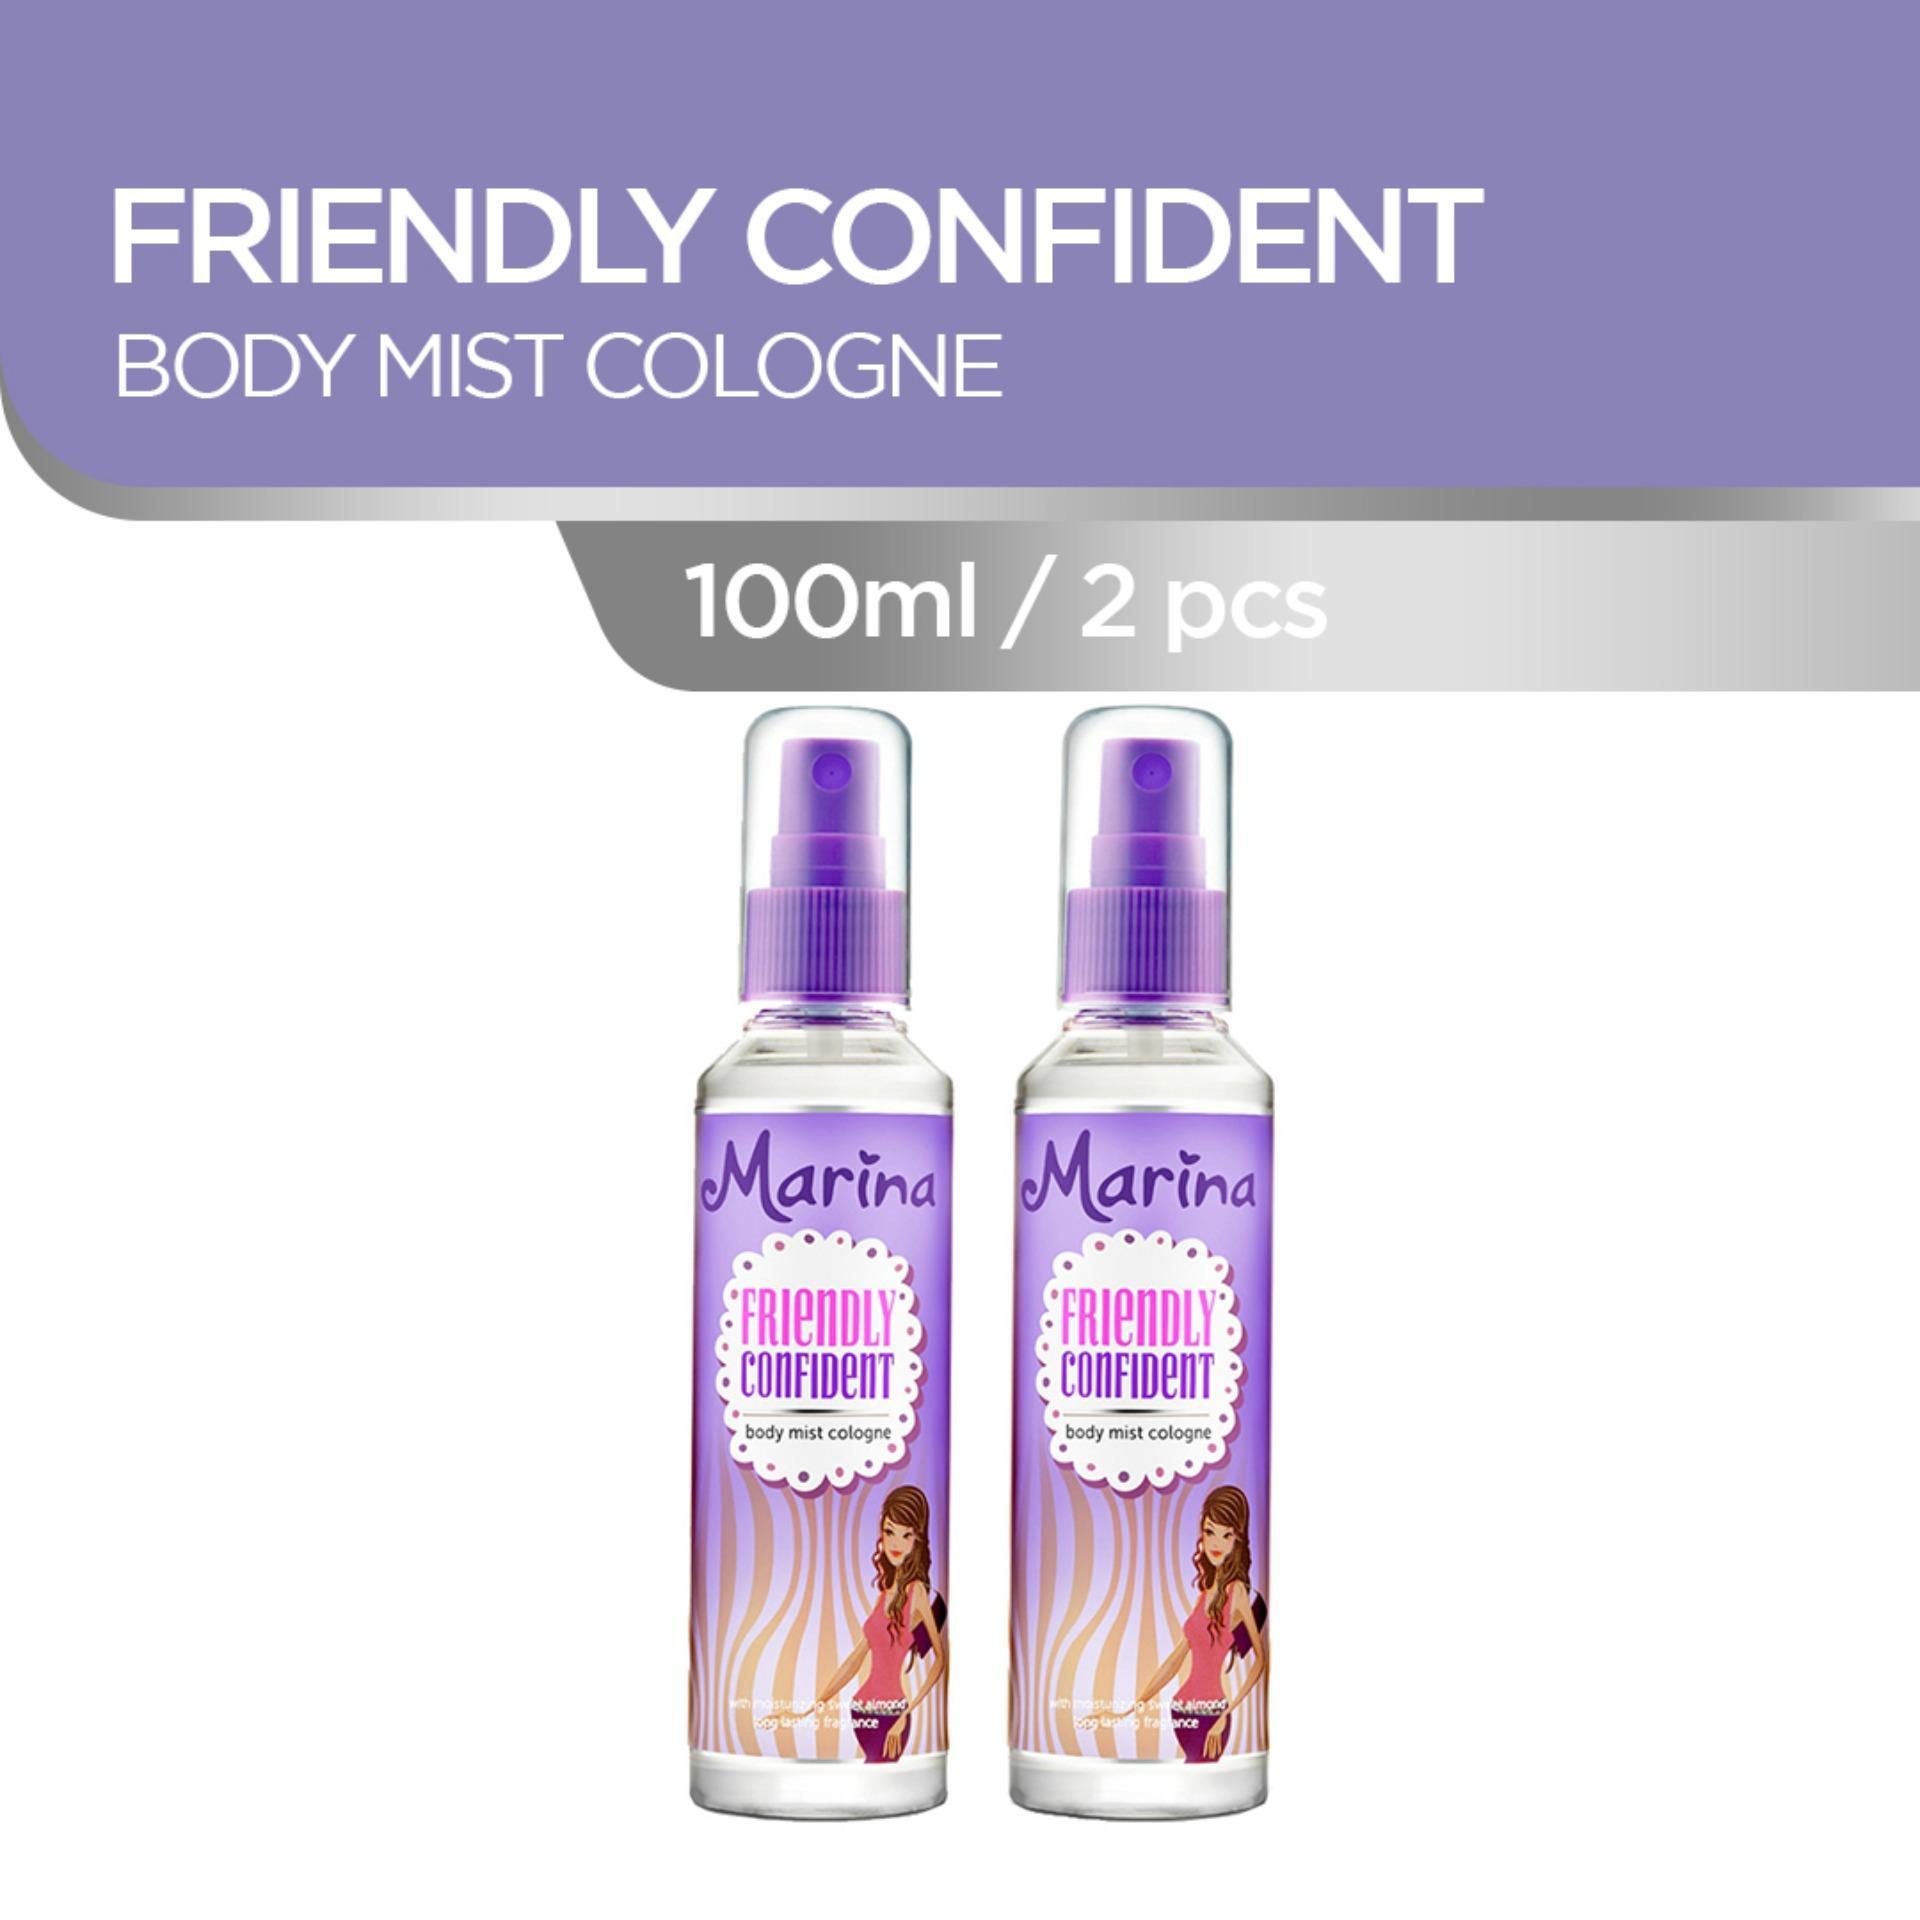 Marina Friendly Confident Body Mist Cologne [100 mL/2 pcs]